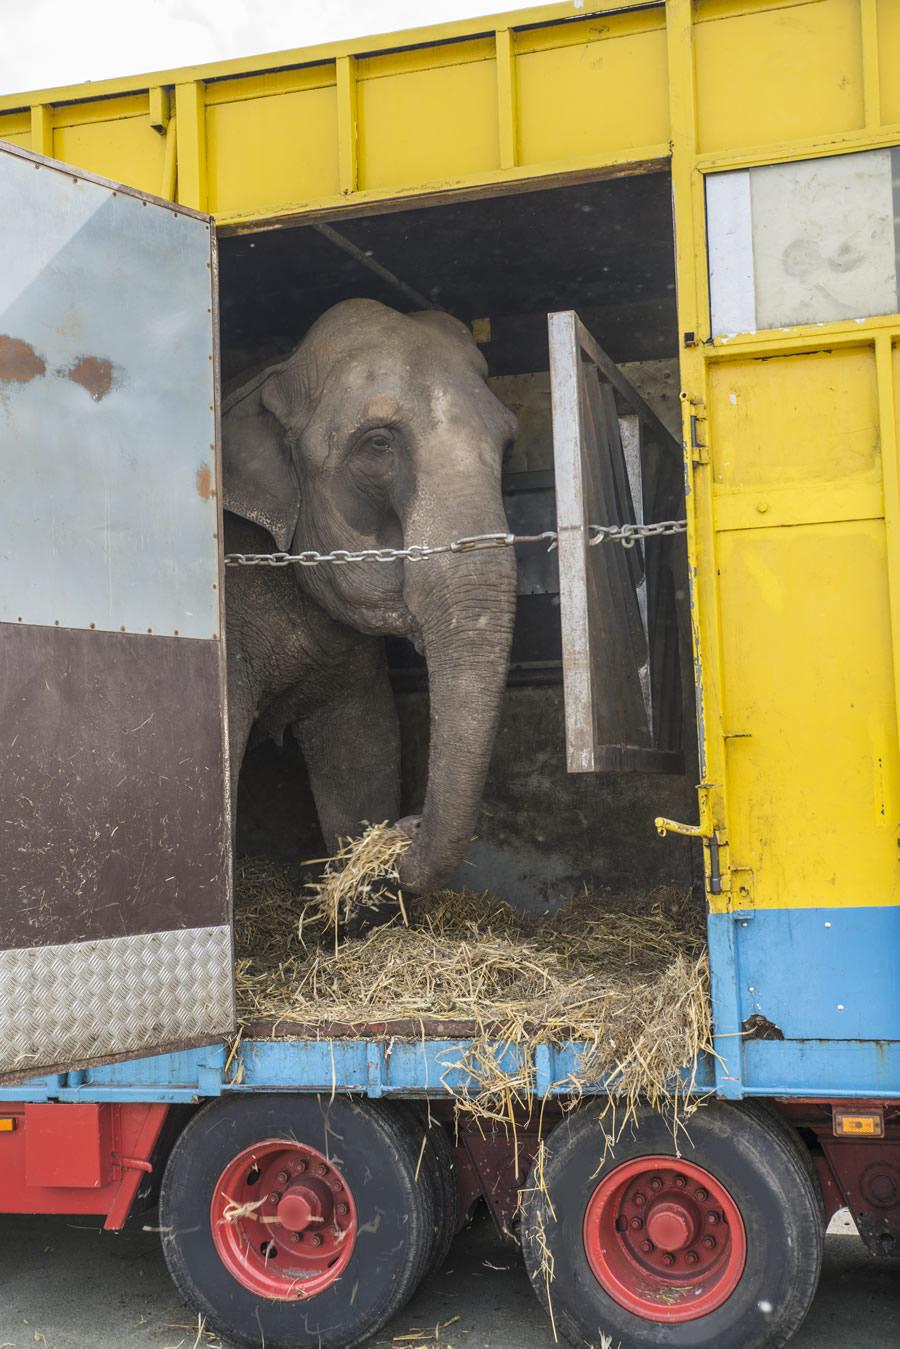 circus-elephants-elephant-in-trailer